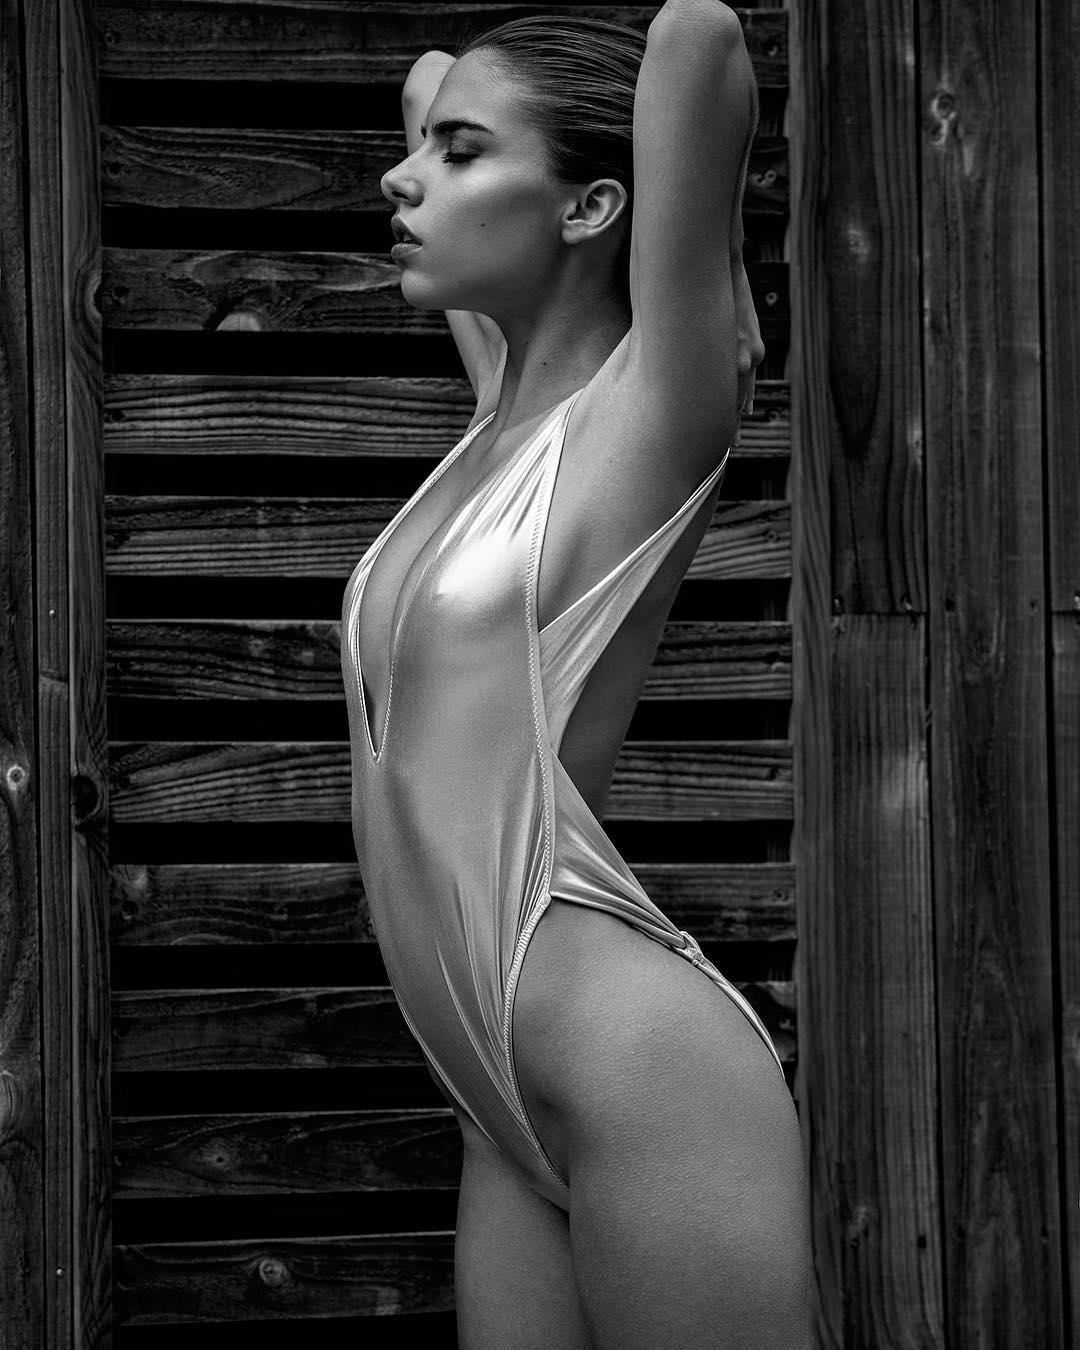 Bikini Snapchat Rebecca Bagnol naked photo 2017